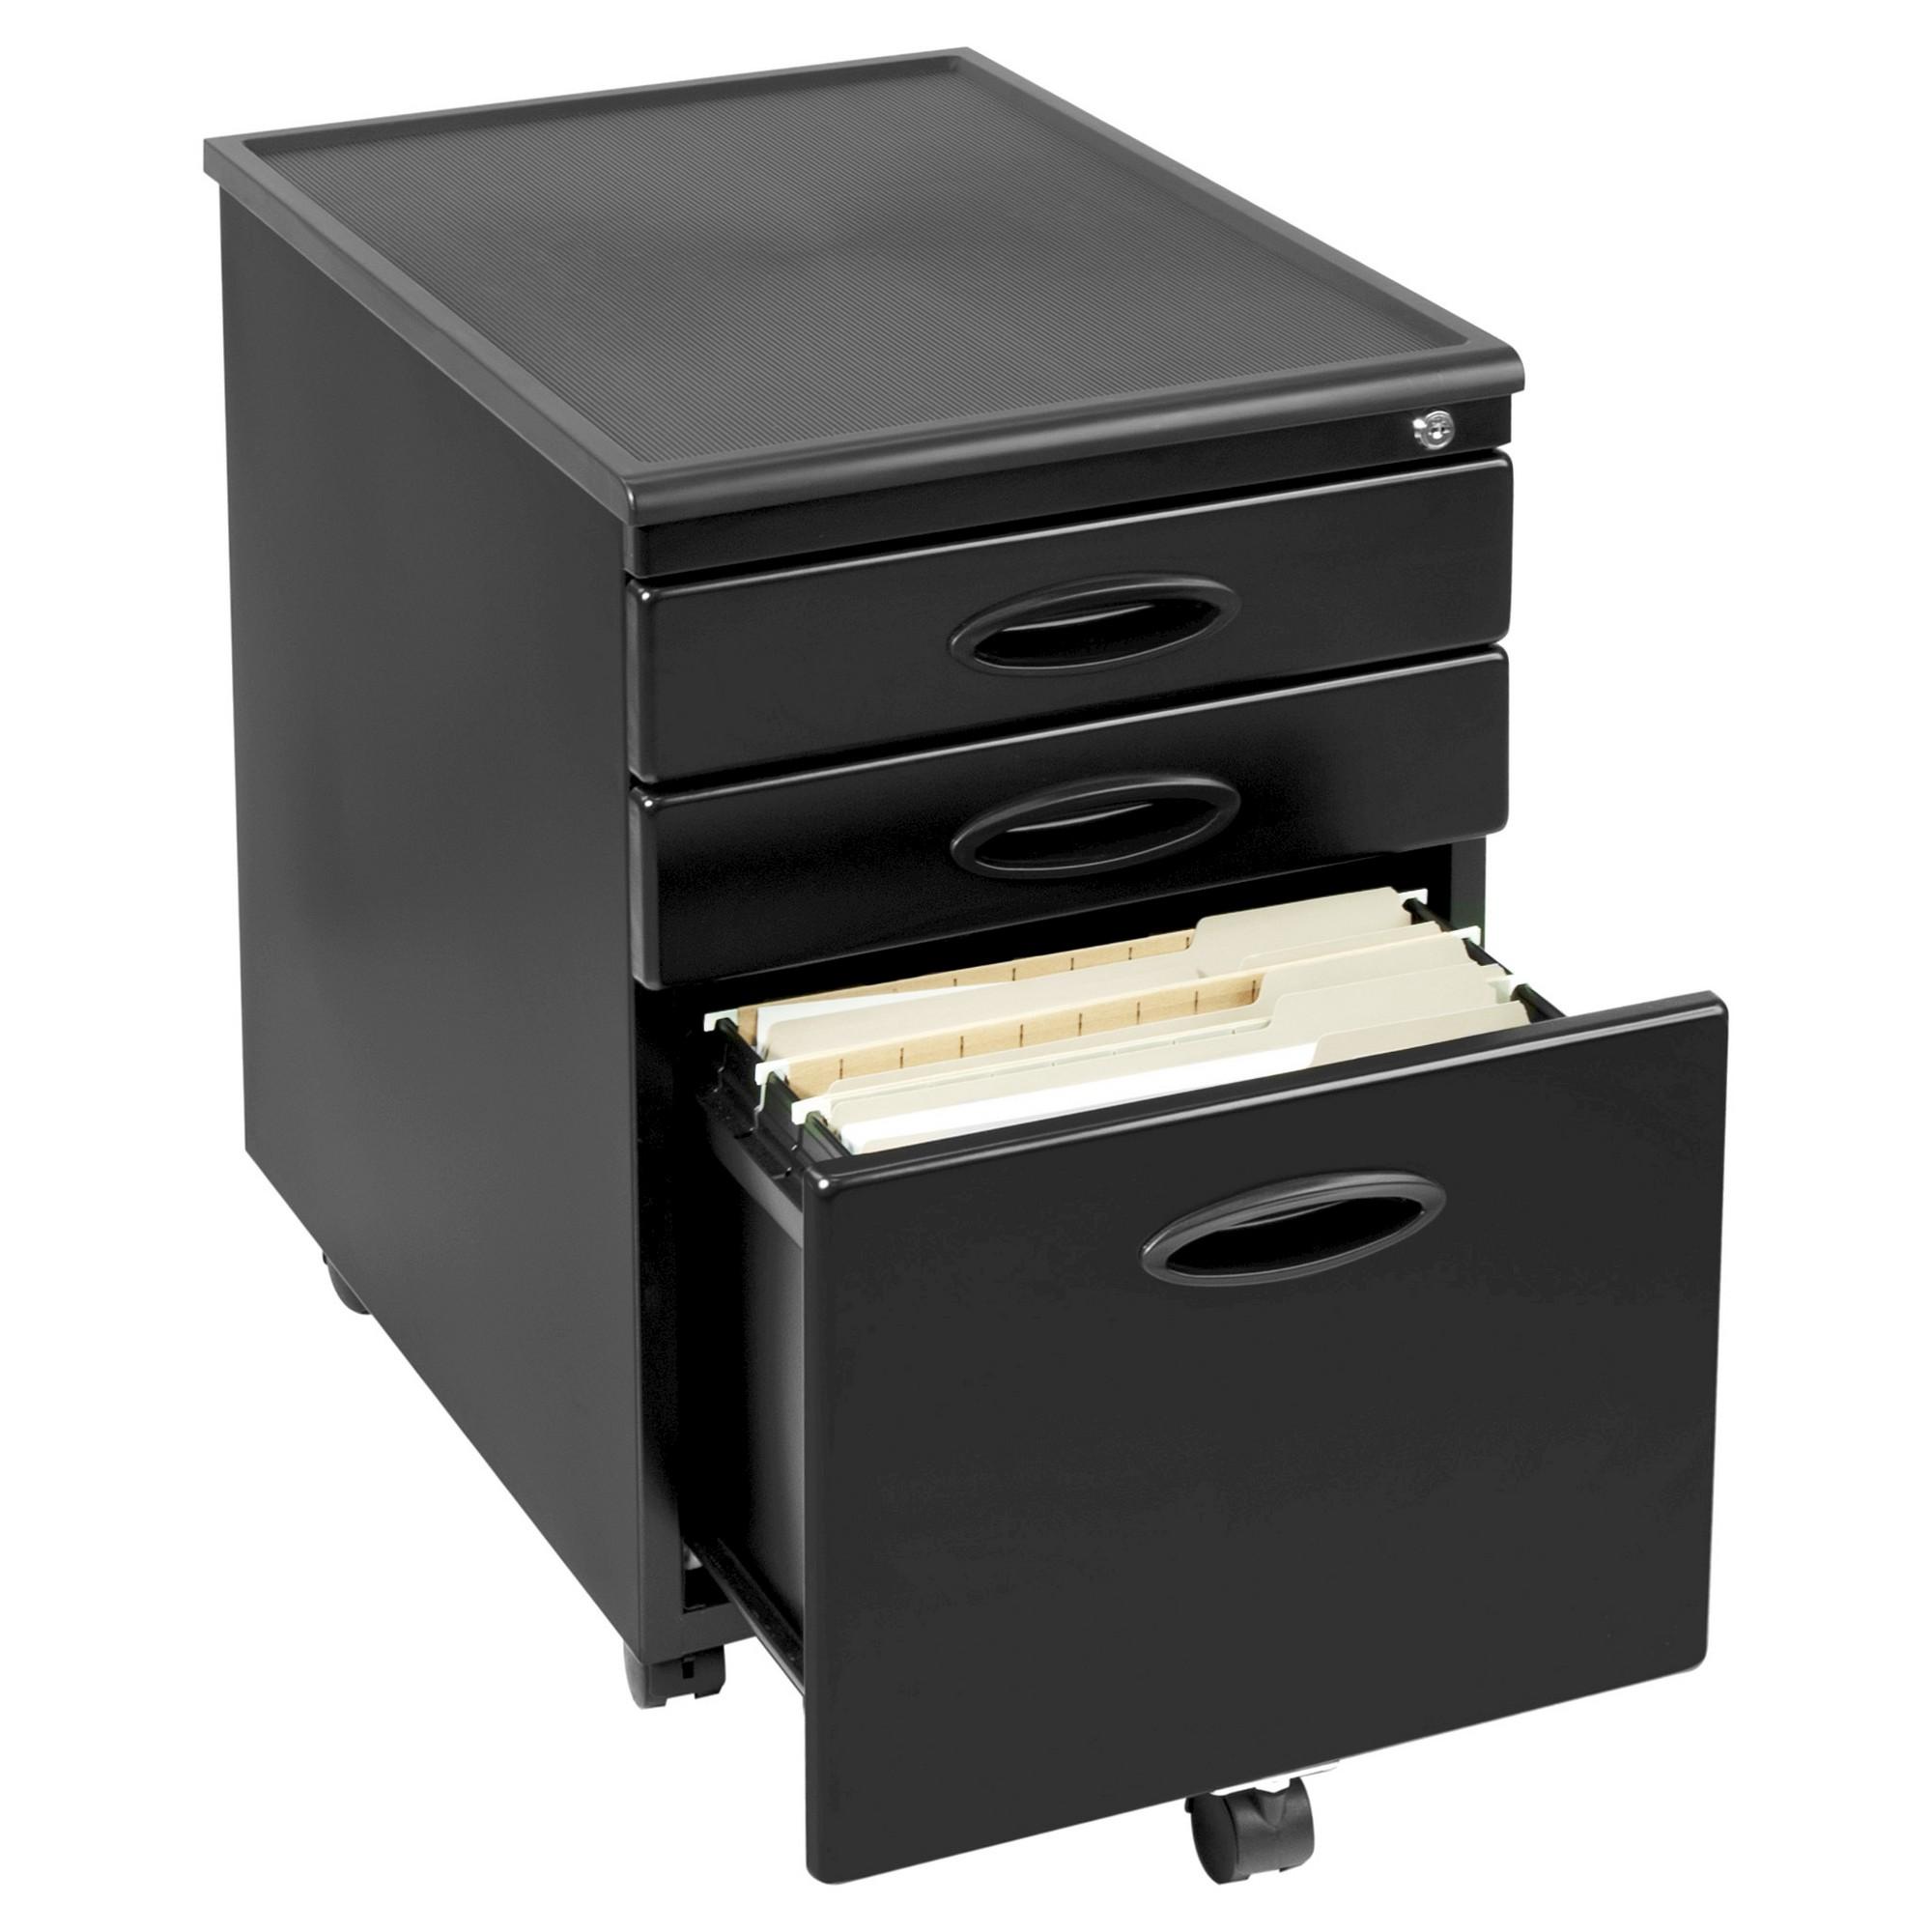 Mobile File Cabinet W Locking Drawers Black Mobile File Cabinet Filing Cabinet Office Furniture File Cabinets